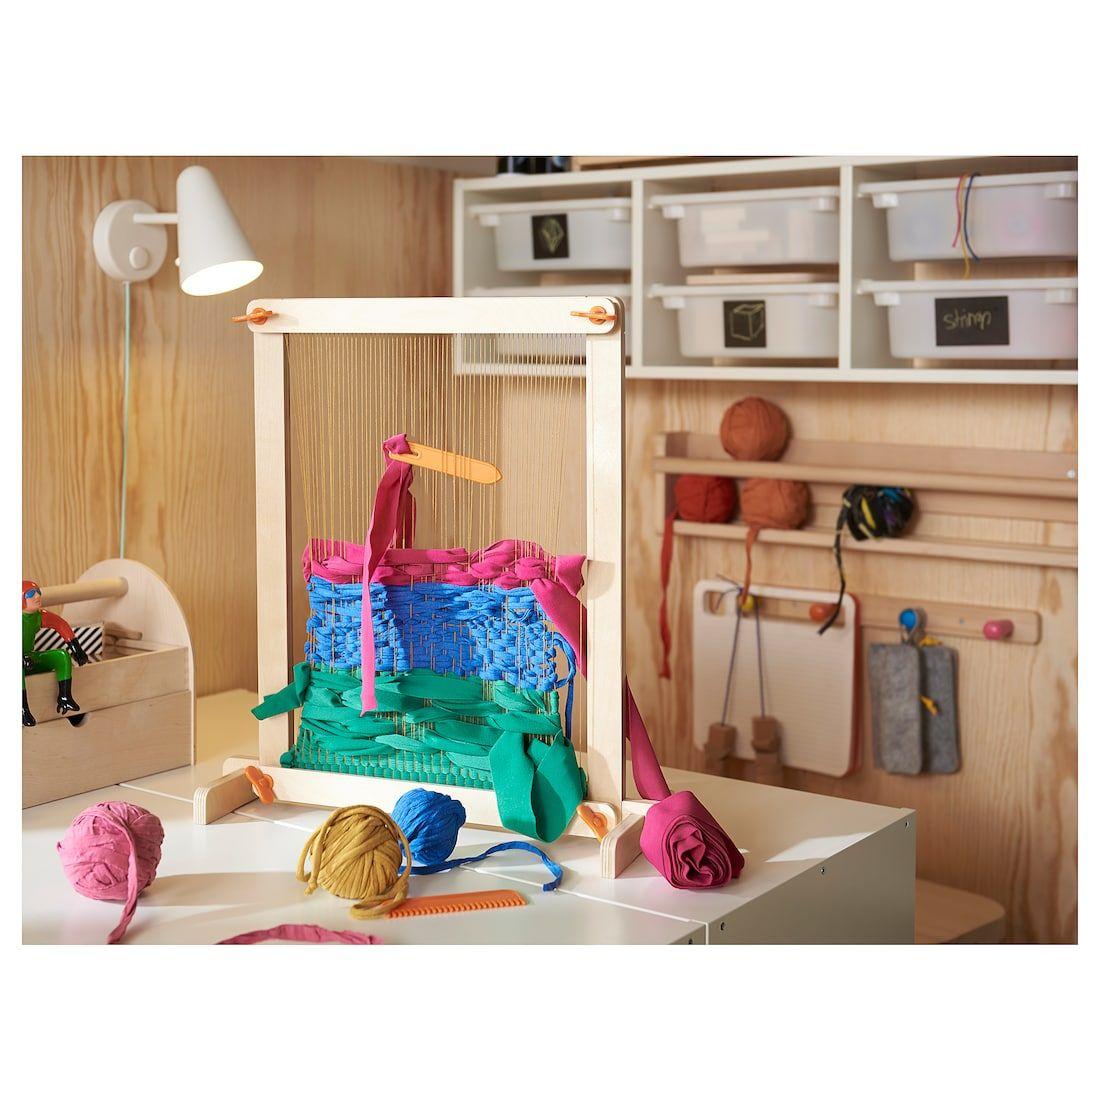 Lustigt 7 Piece Weaving Loom Set Nice Idea Home Decor